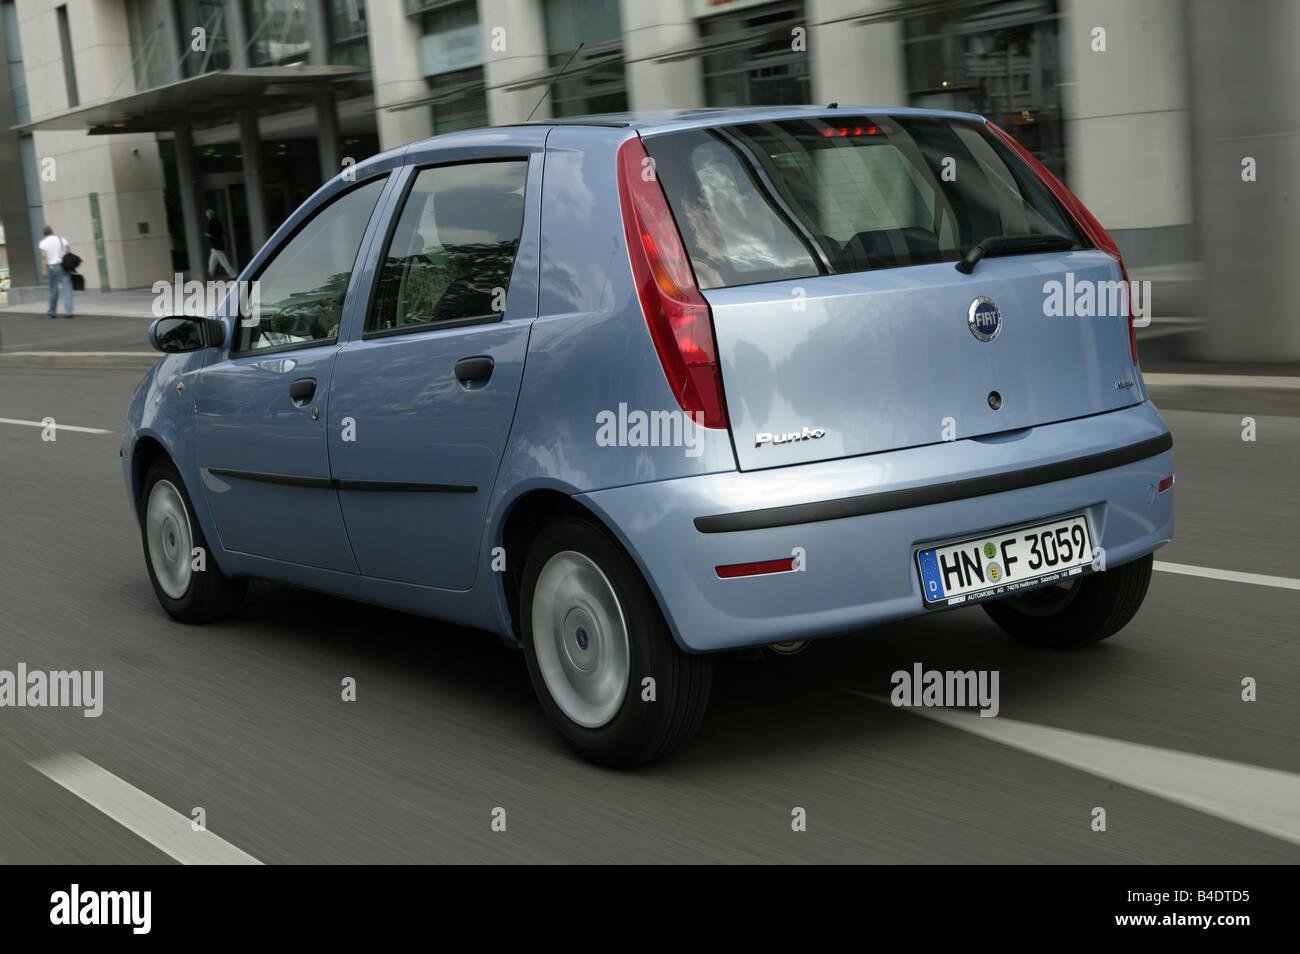 Car, Fiat Punto 1.3 JTD, small approx., Limousine, light Stock Photo